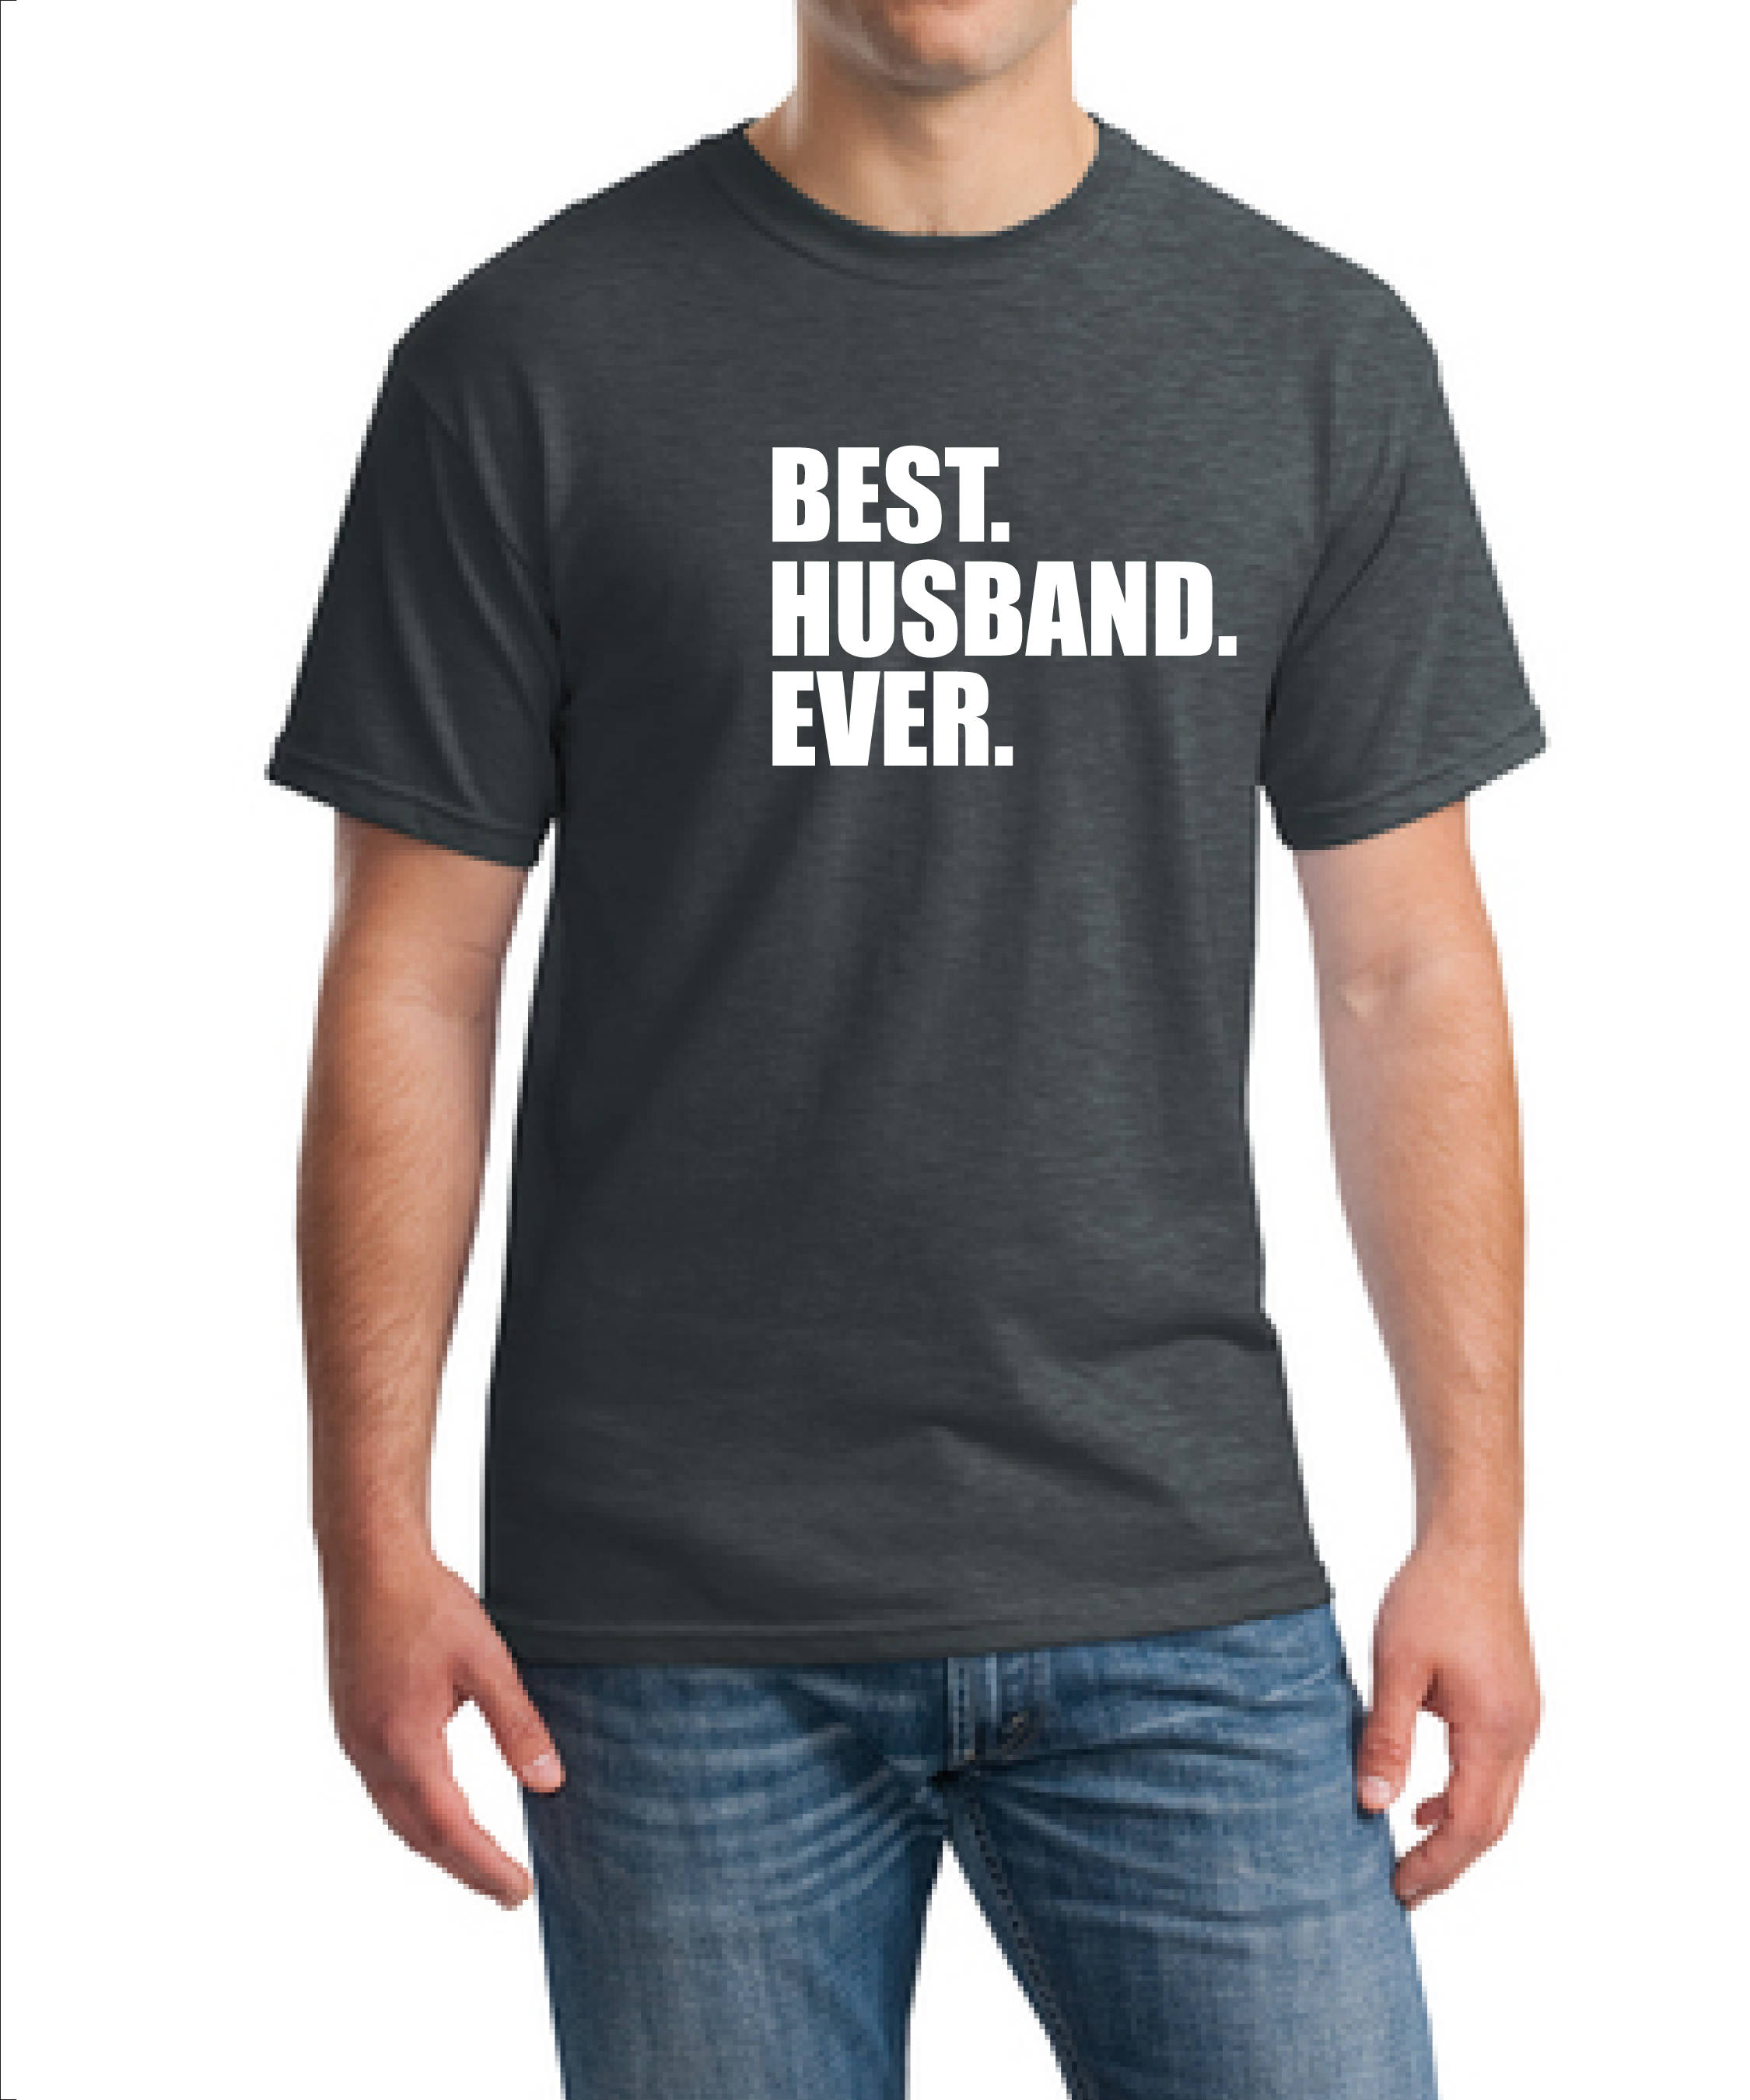 Wedding Outfit Wedding Gift Husband Gift Hubs T-Shirt Just Married Tee Hubby T-Shirt Best Husband Ever Men/'s T-Shirt Husband T-Shirt